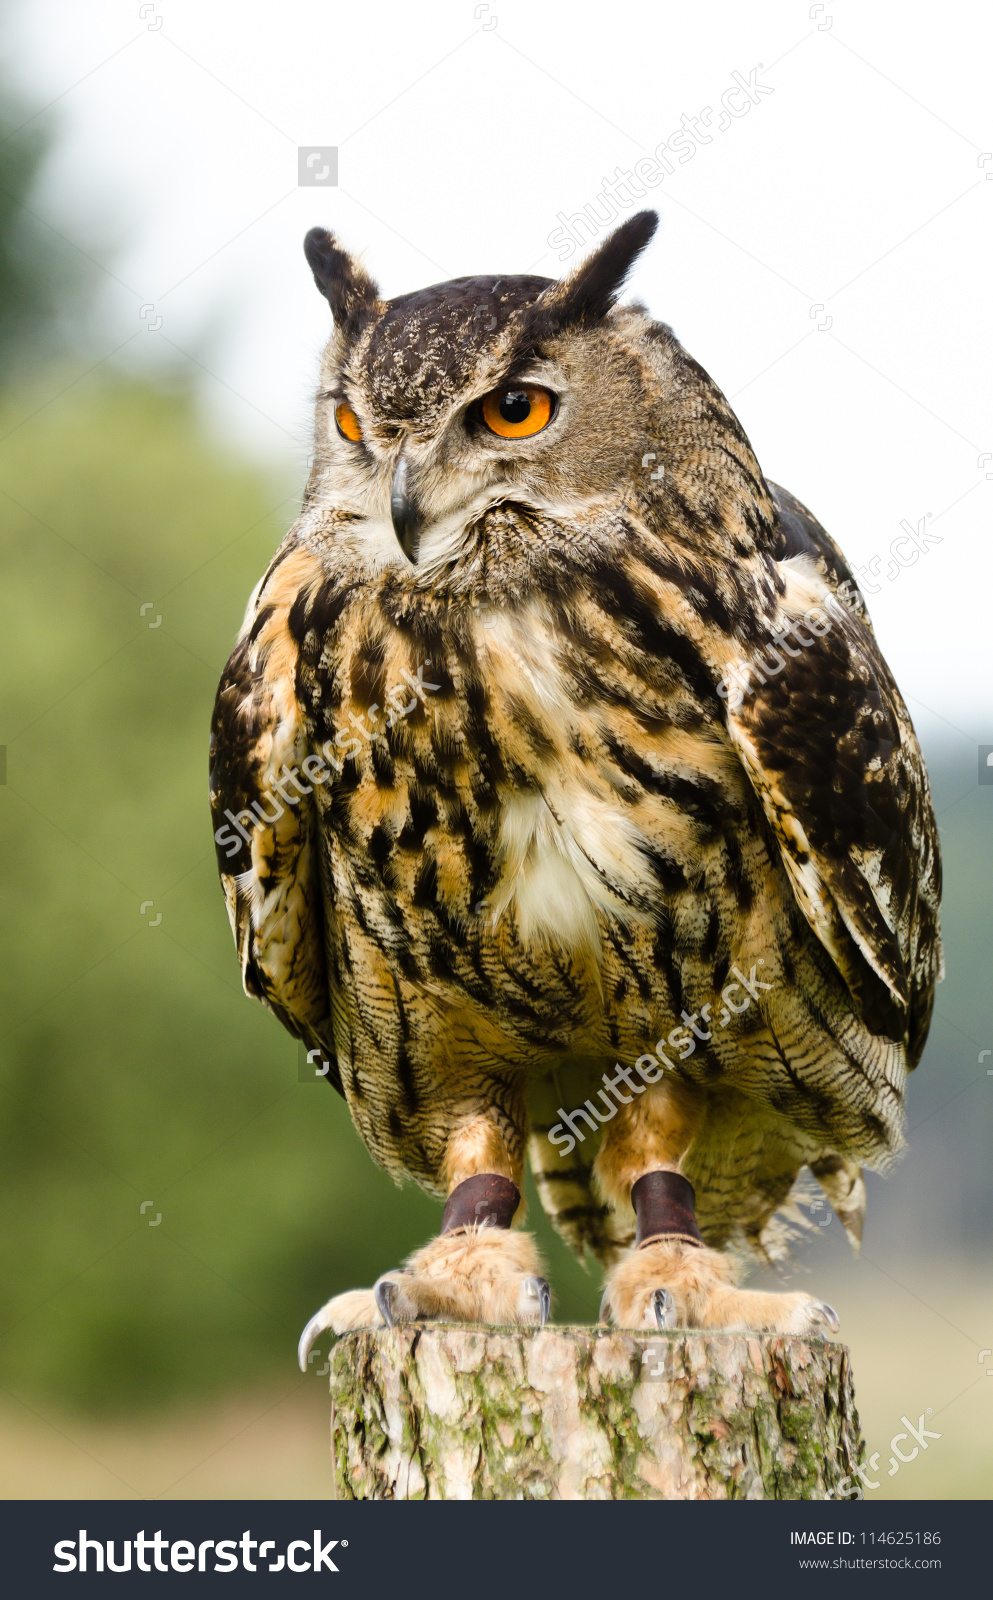 Eurasian Eagle Owl On Log Eurasian Stock Photo 114625186.